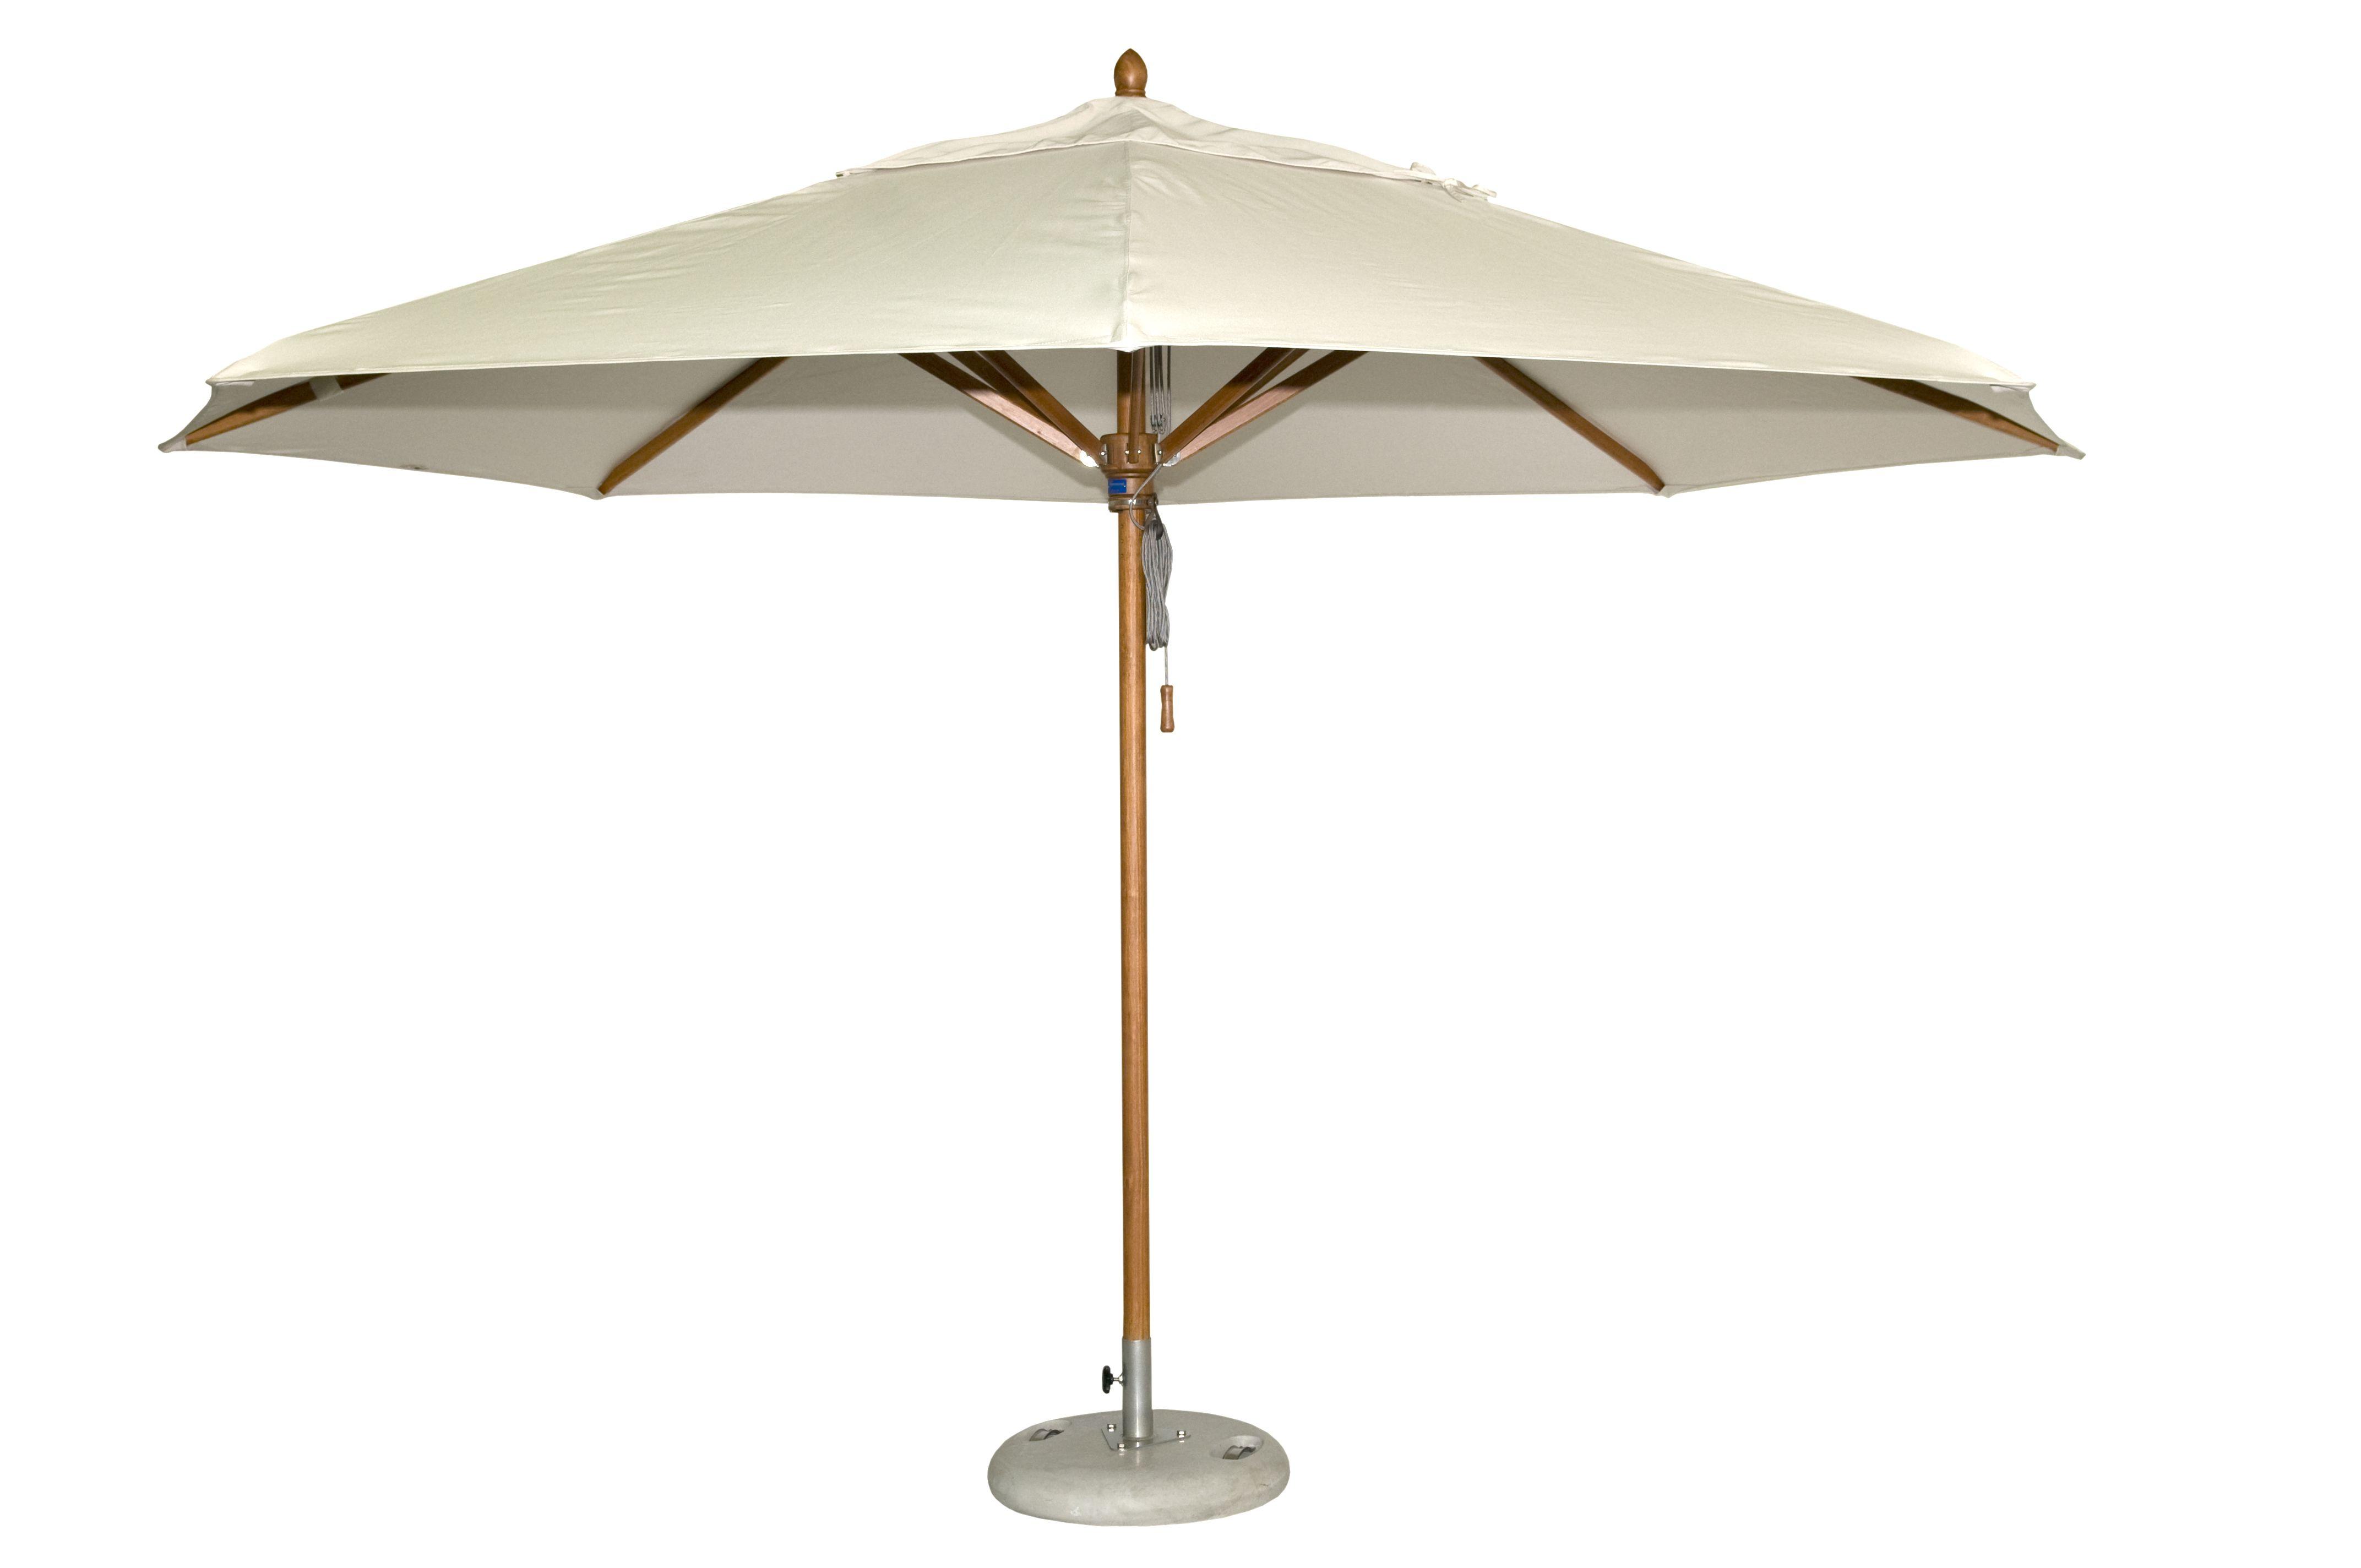 Tradewinds Garden Umbrella Classic Outdoor Decor Patio